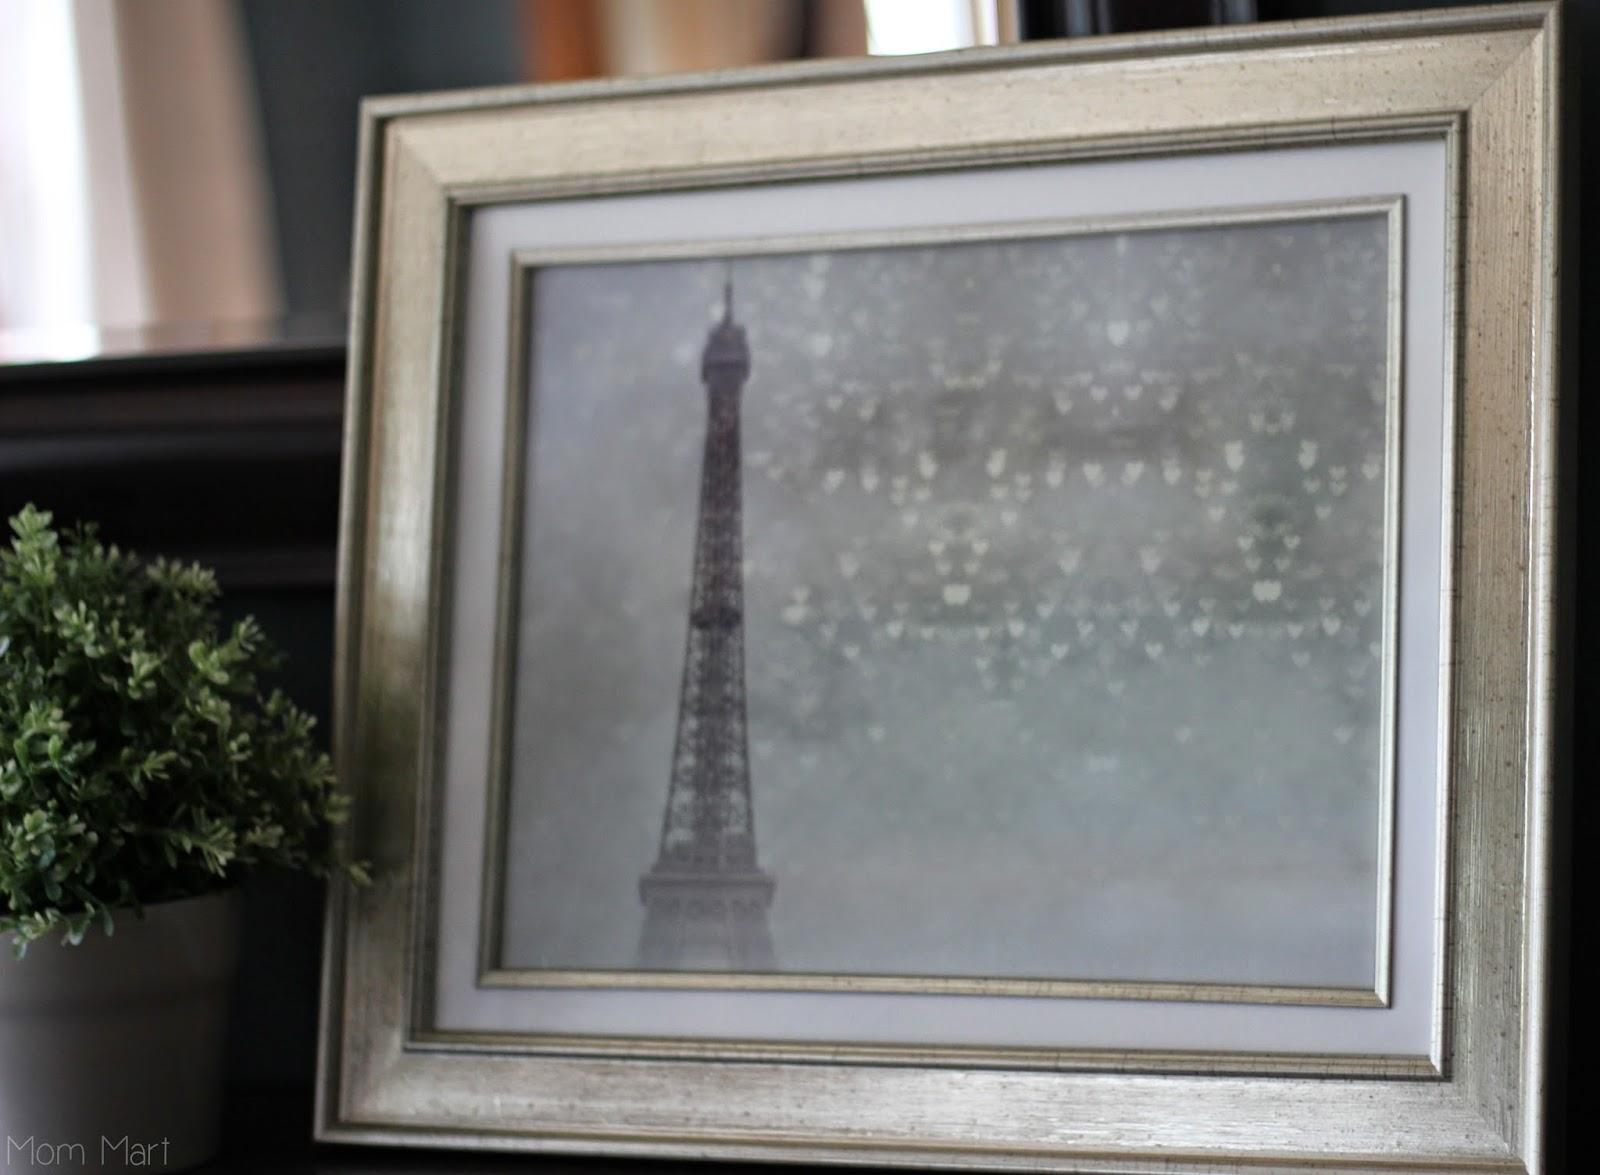 Inexpensive Dining Room Makeover #Vignette #DIY #Makeover #Paris #DiningRoomArt